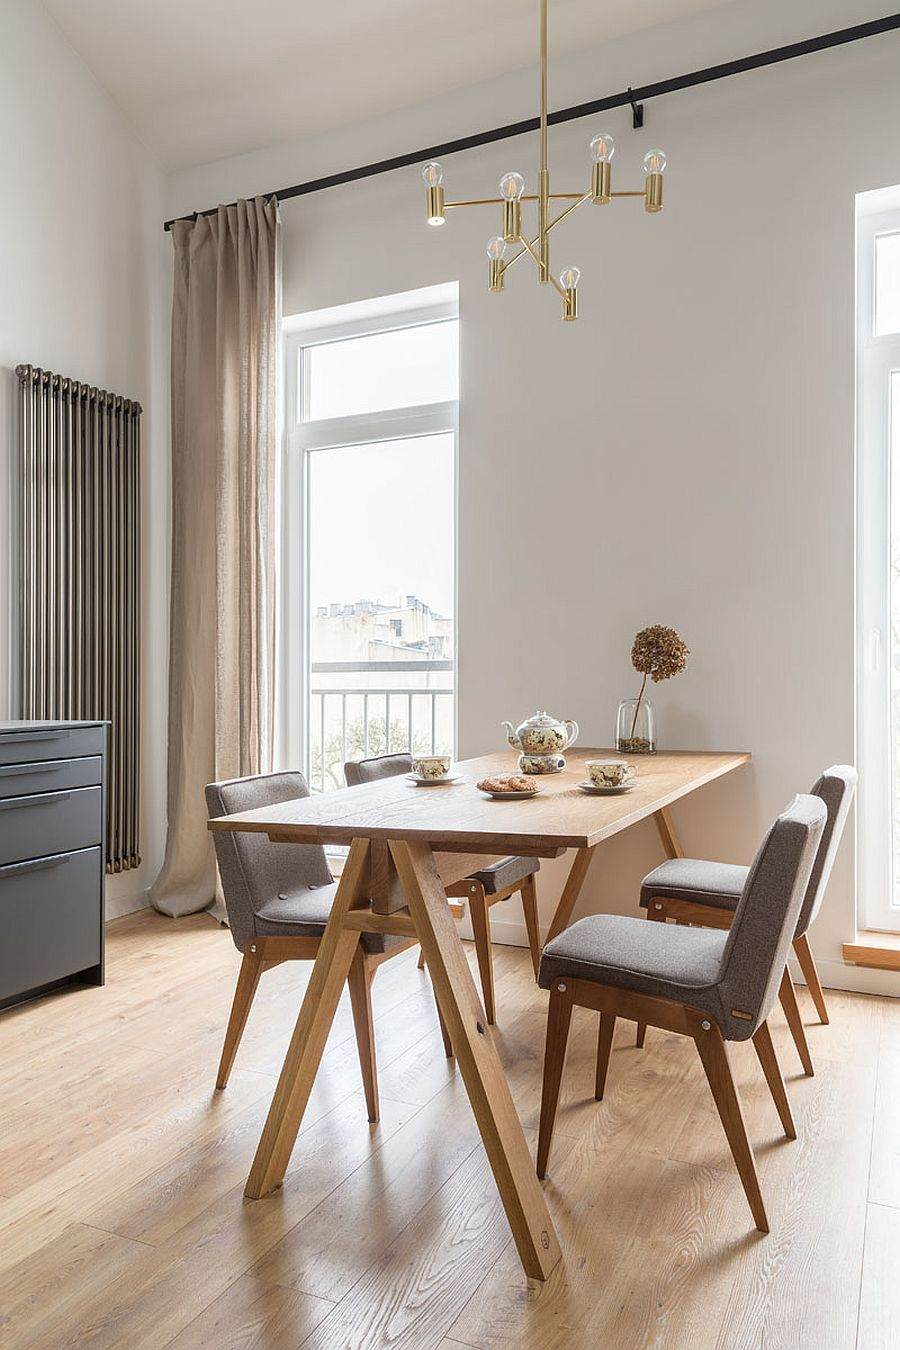 Multiple-windows-illuminate-the-lower-level-dining-area-and-kitchen